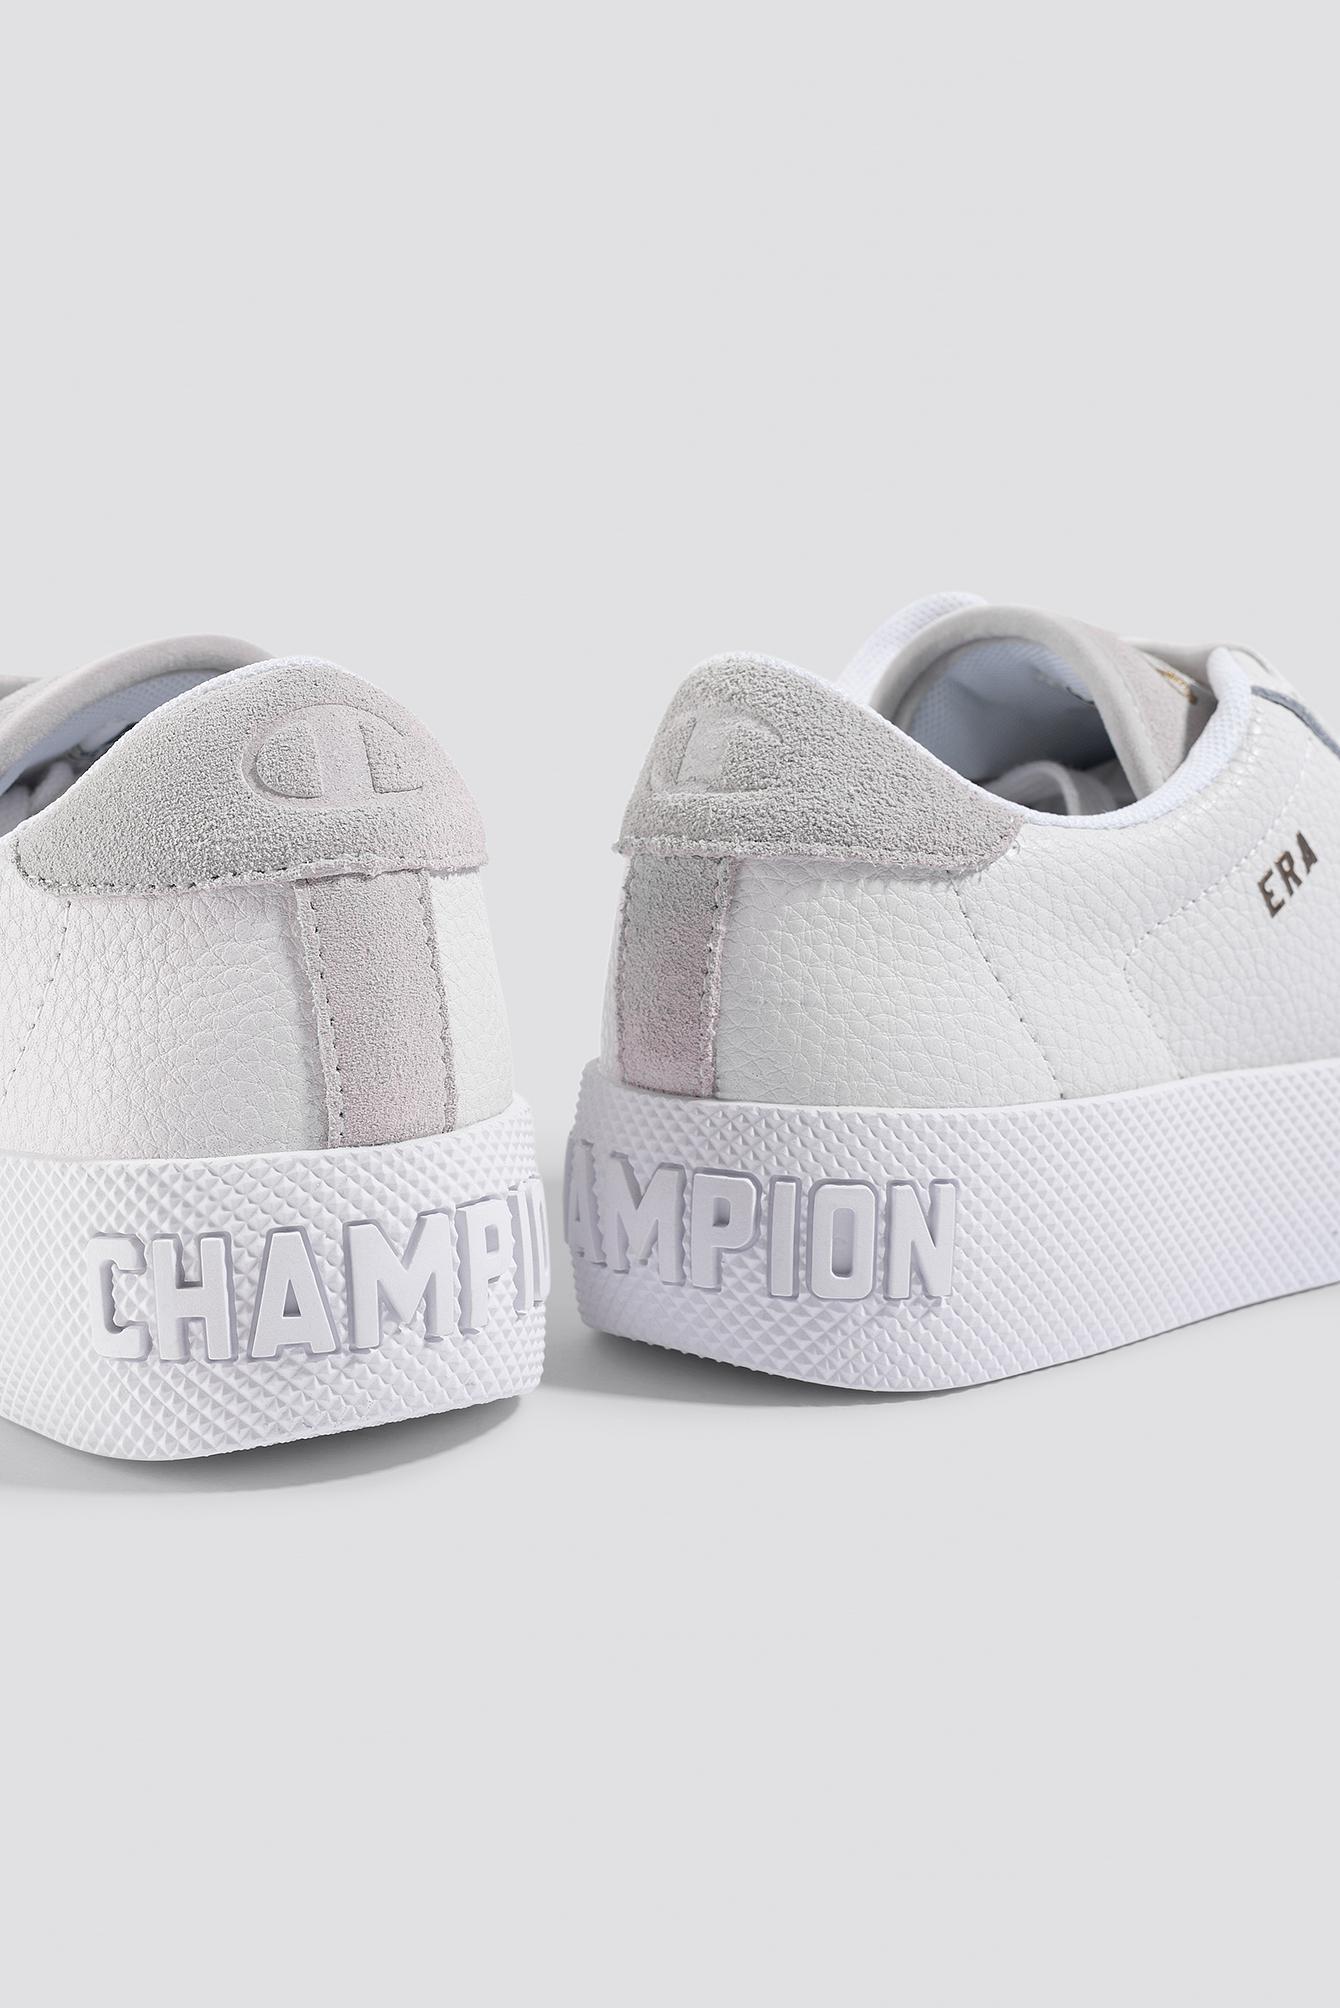 86f205af30c Champion - Era Leather Sneaker S10535 White - Lyst. View fullscreen